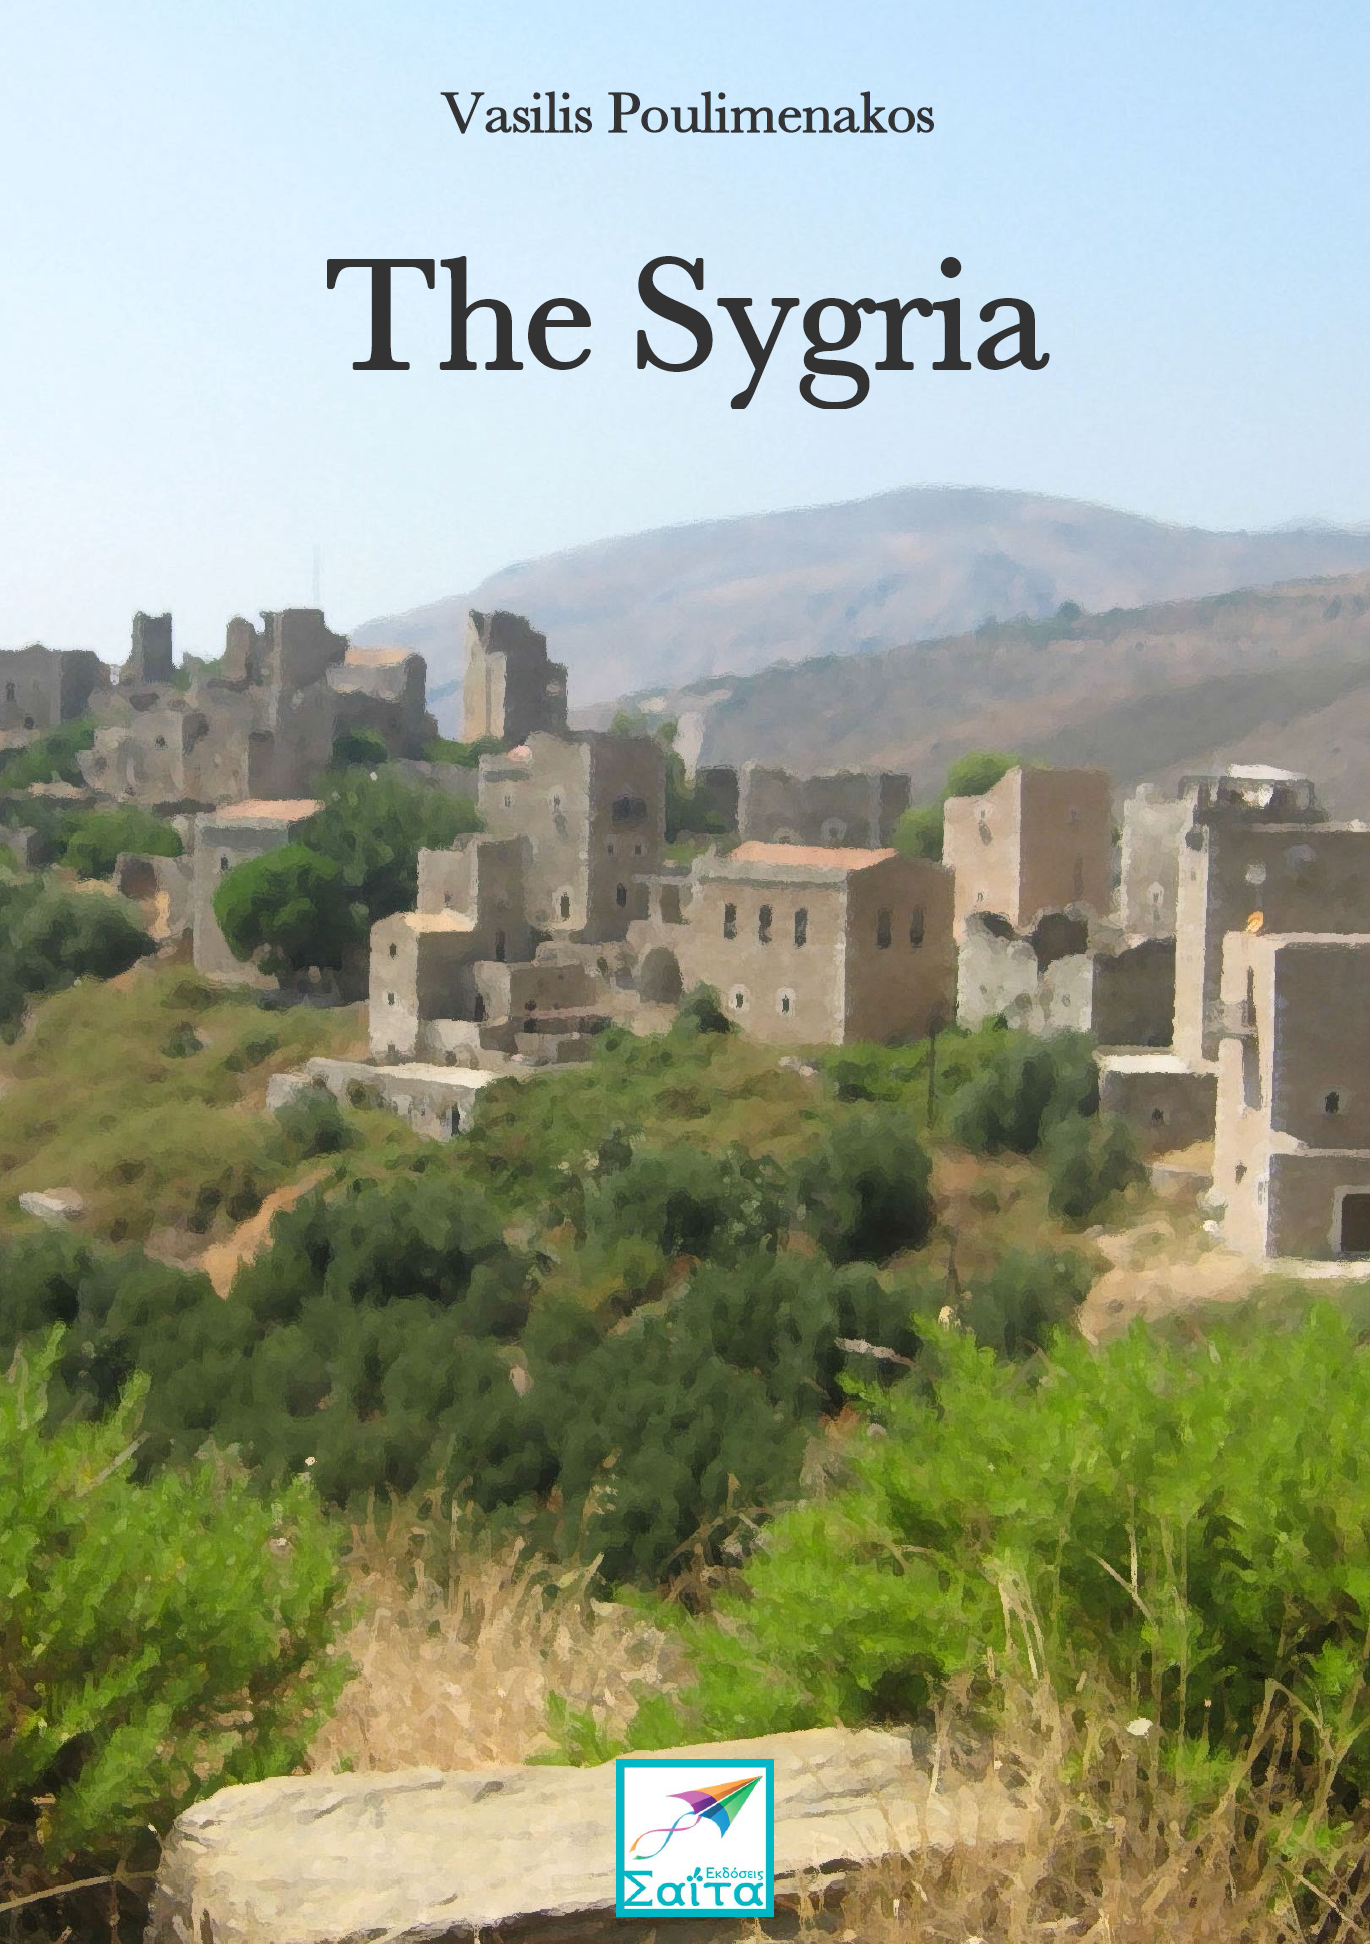 The Sygria, Vasilis Poulimenakos, Translation from Greek: Christina Ioannidou, Saita publications, December 2014, ISBN: 978-618-5147-06-8 Download it for free at: www.saitabooks.eu/2014/12/ebook.127.html